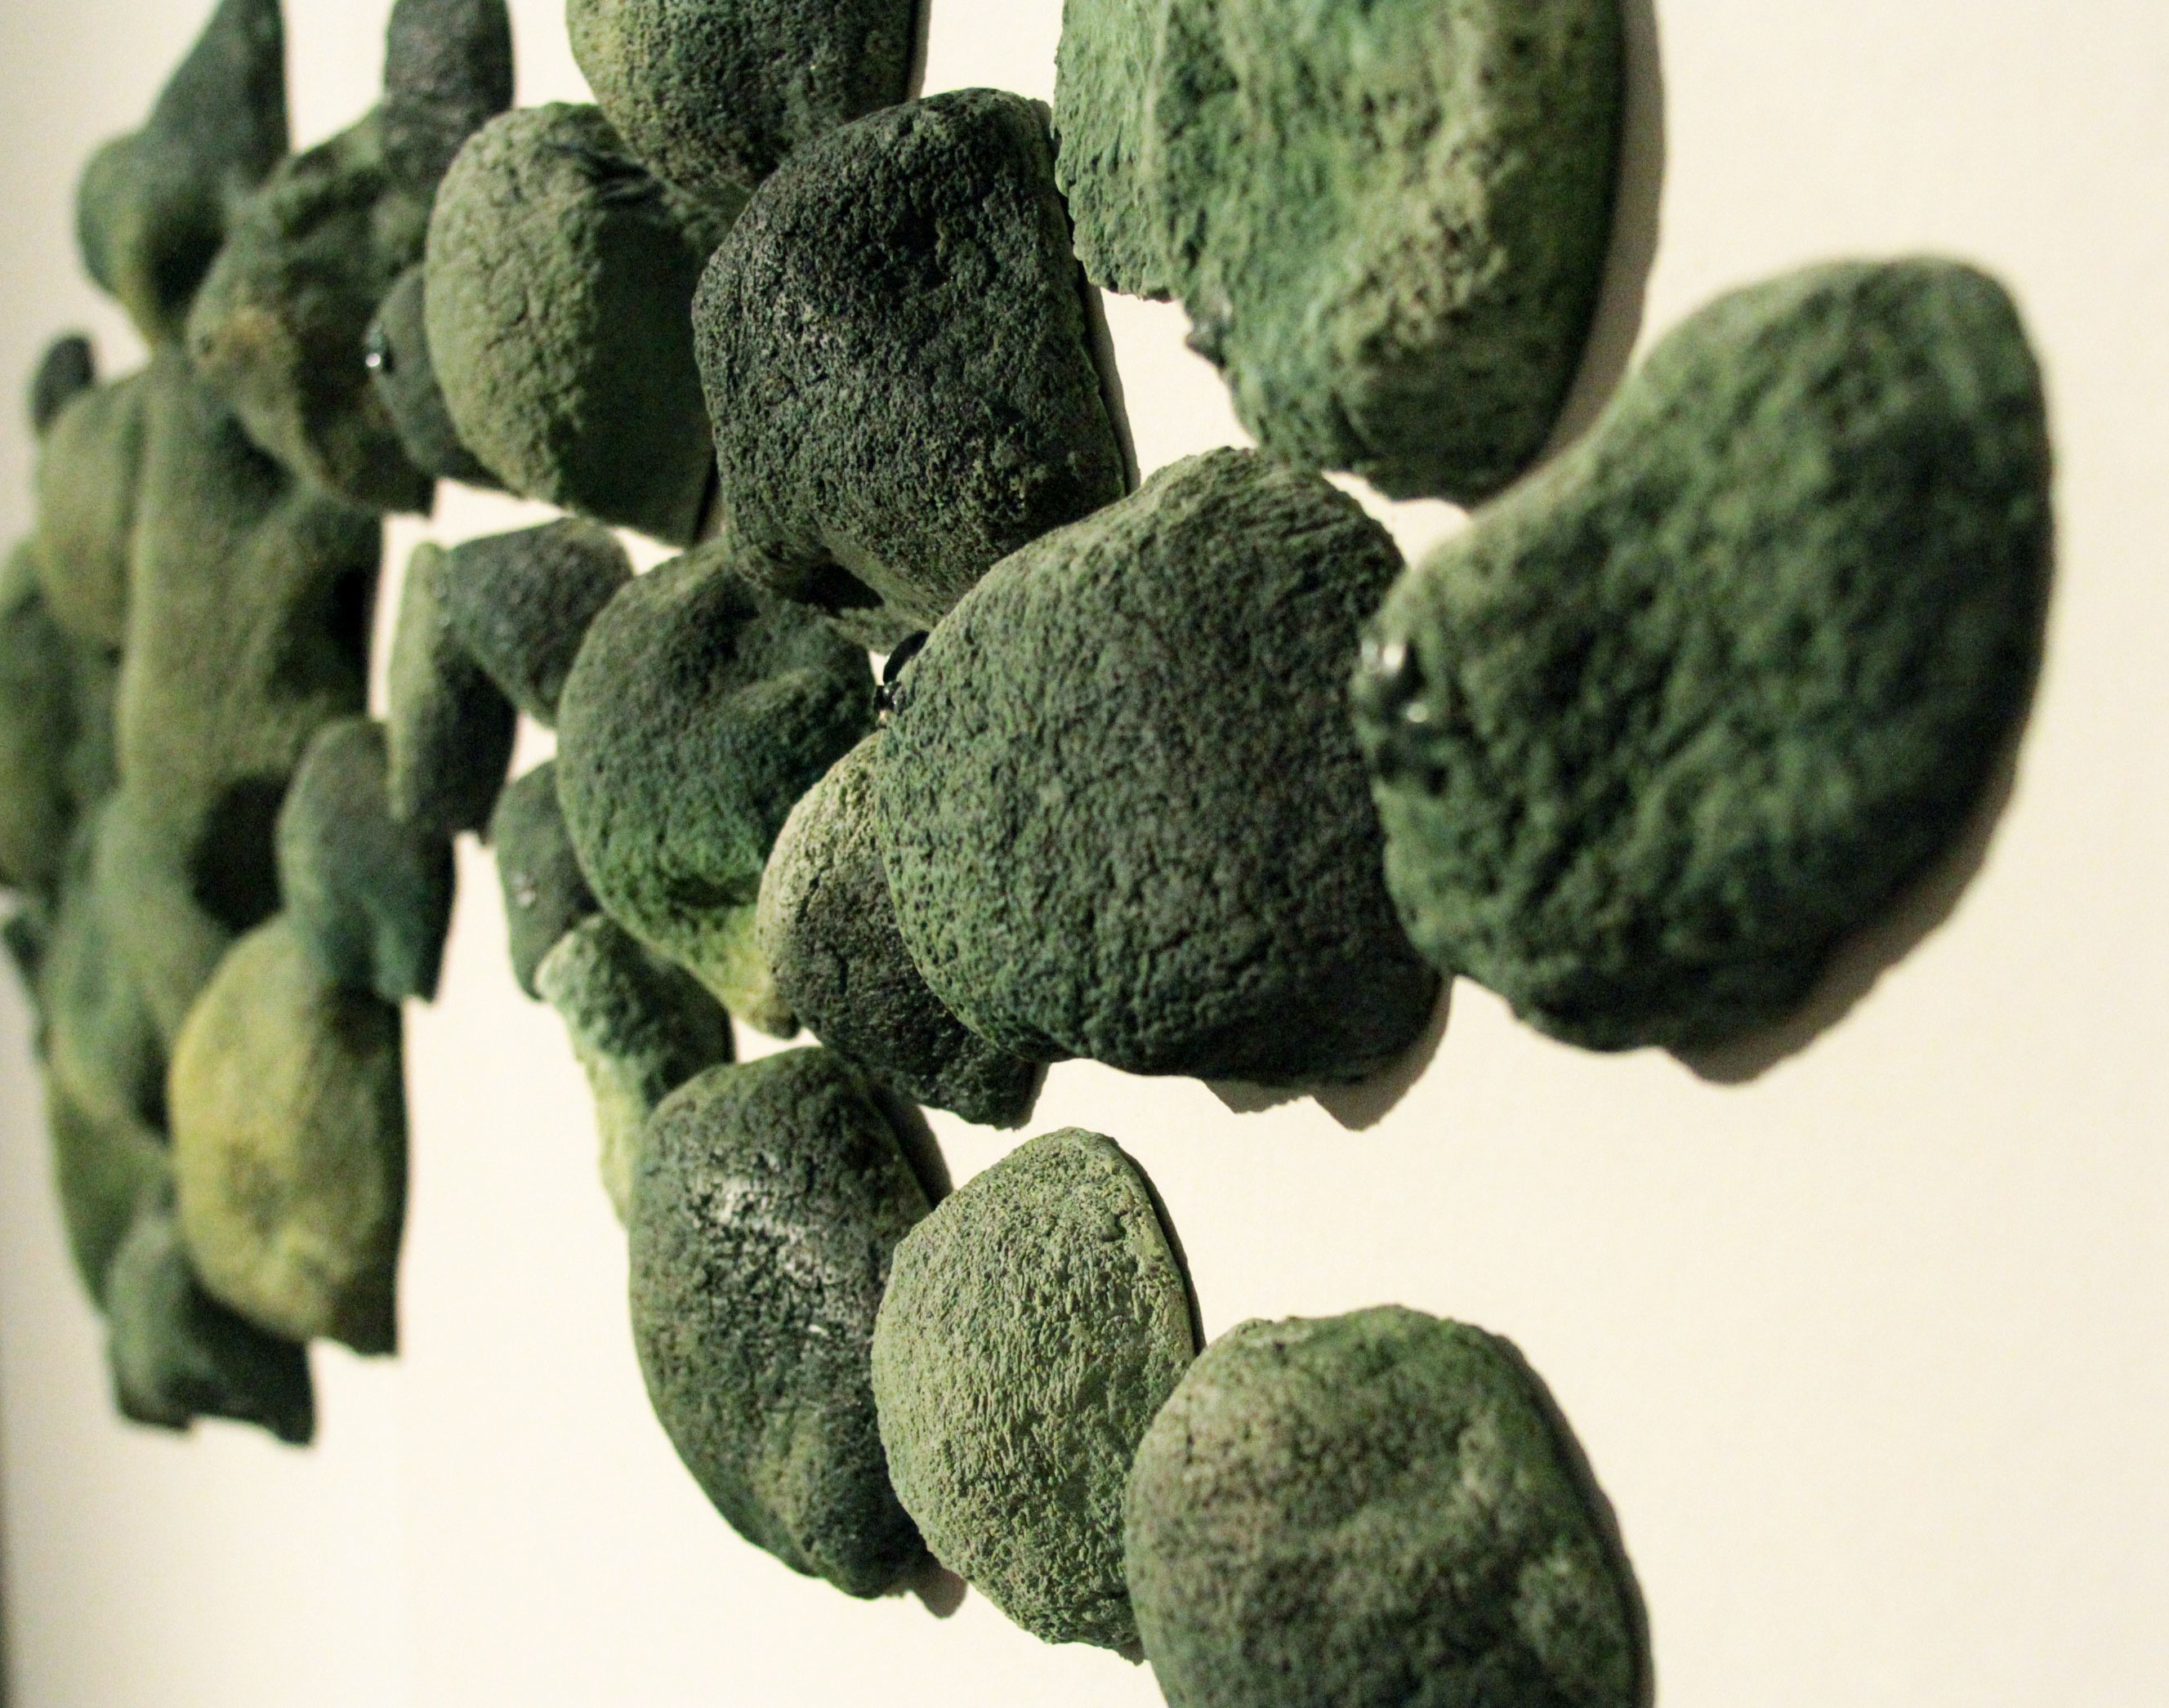 Musgos/ Mosses